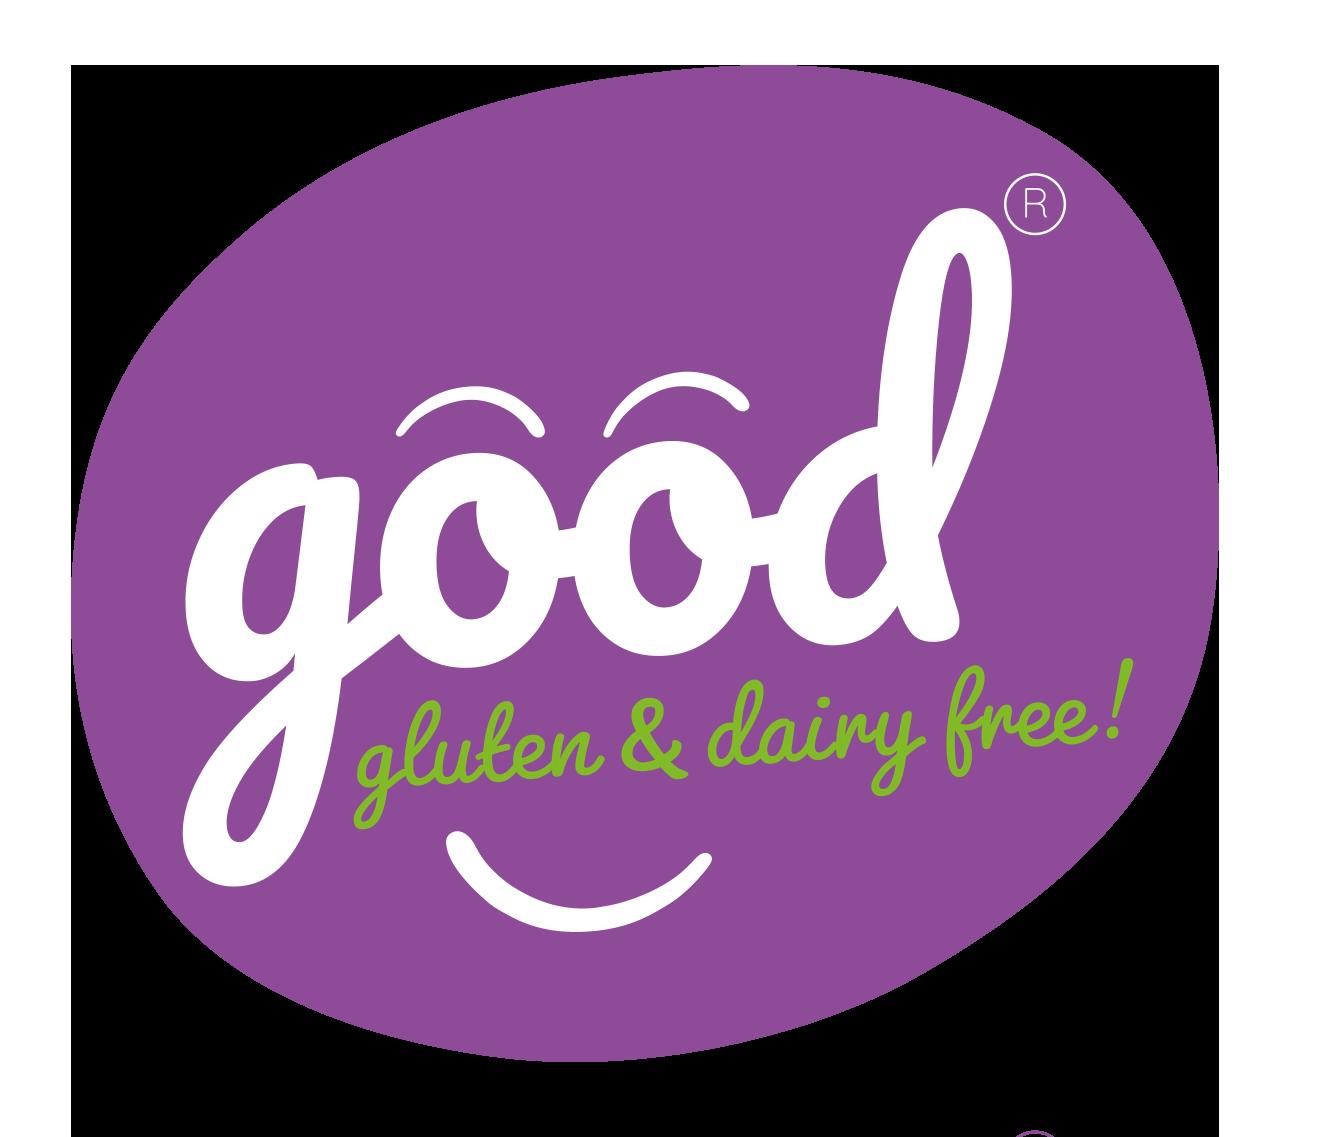 good its gluten free logo